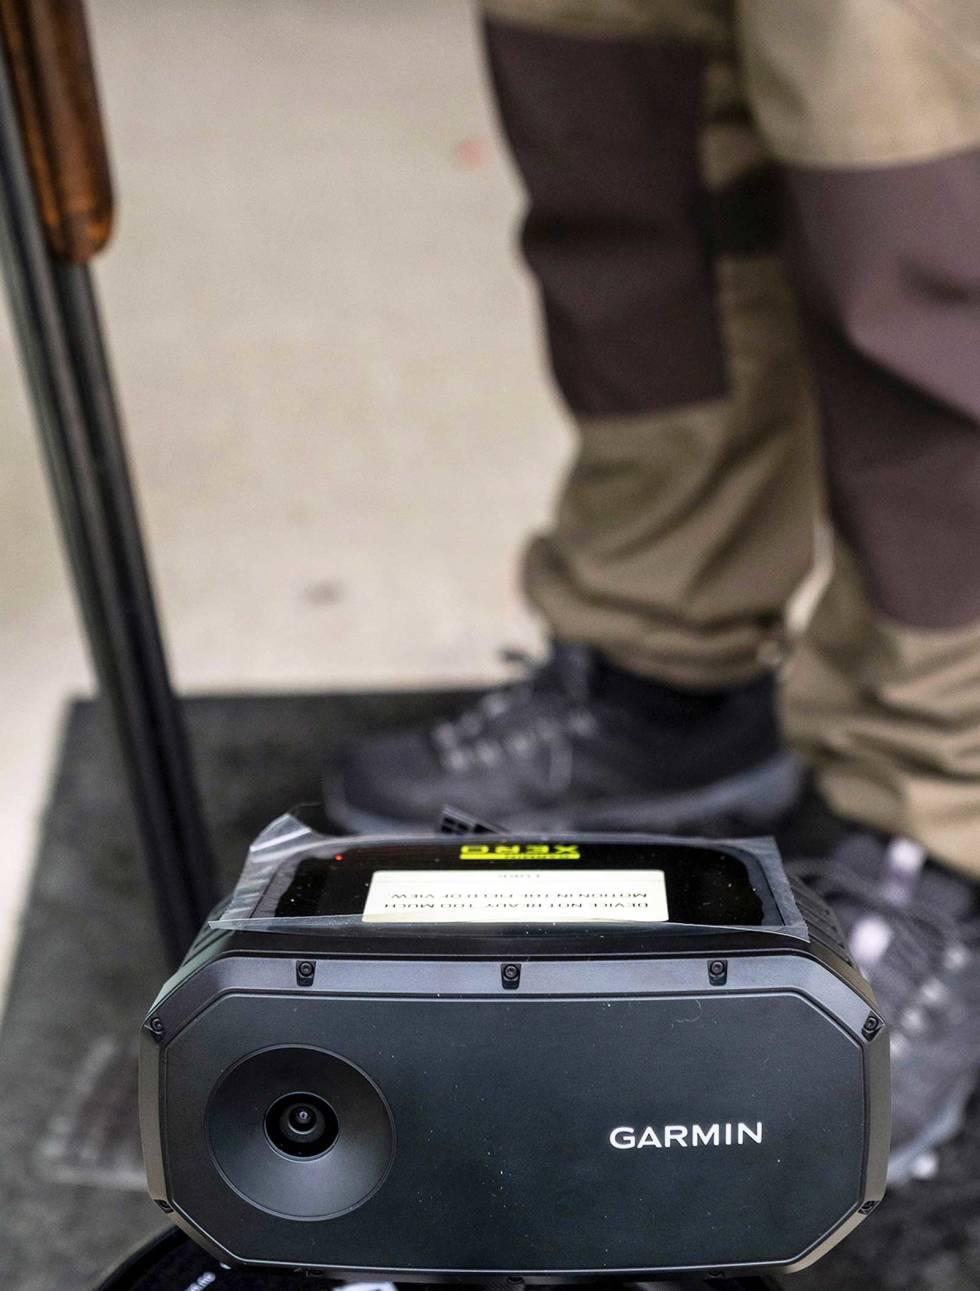 Test-av-hagleradar-Garmin-Xero-S1-5